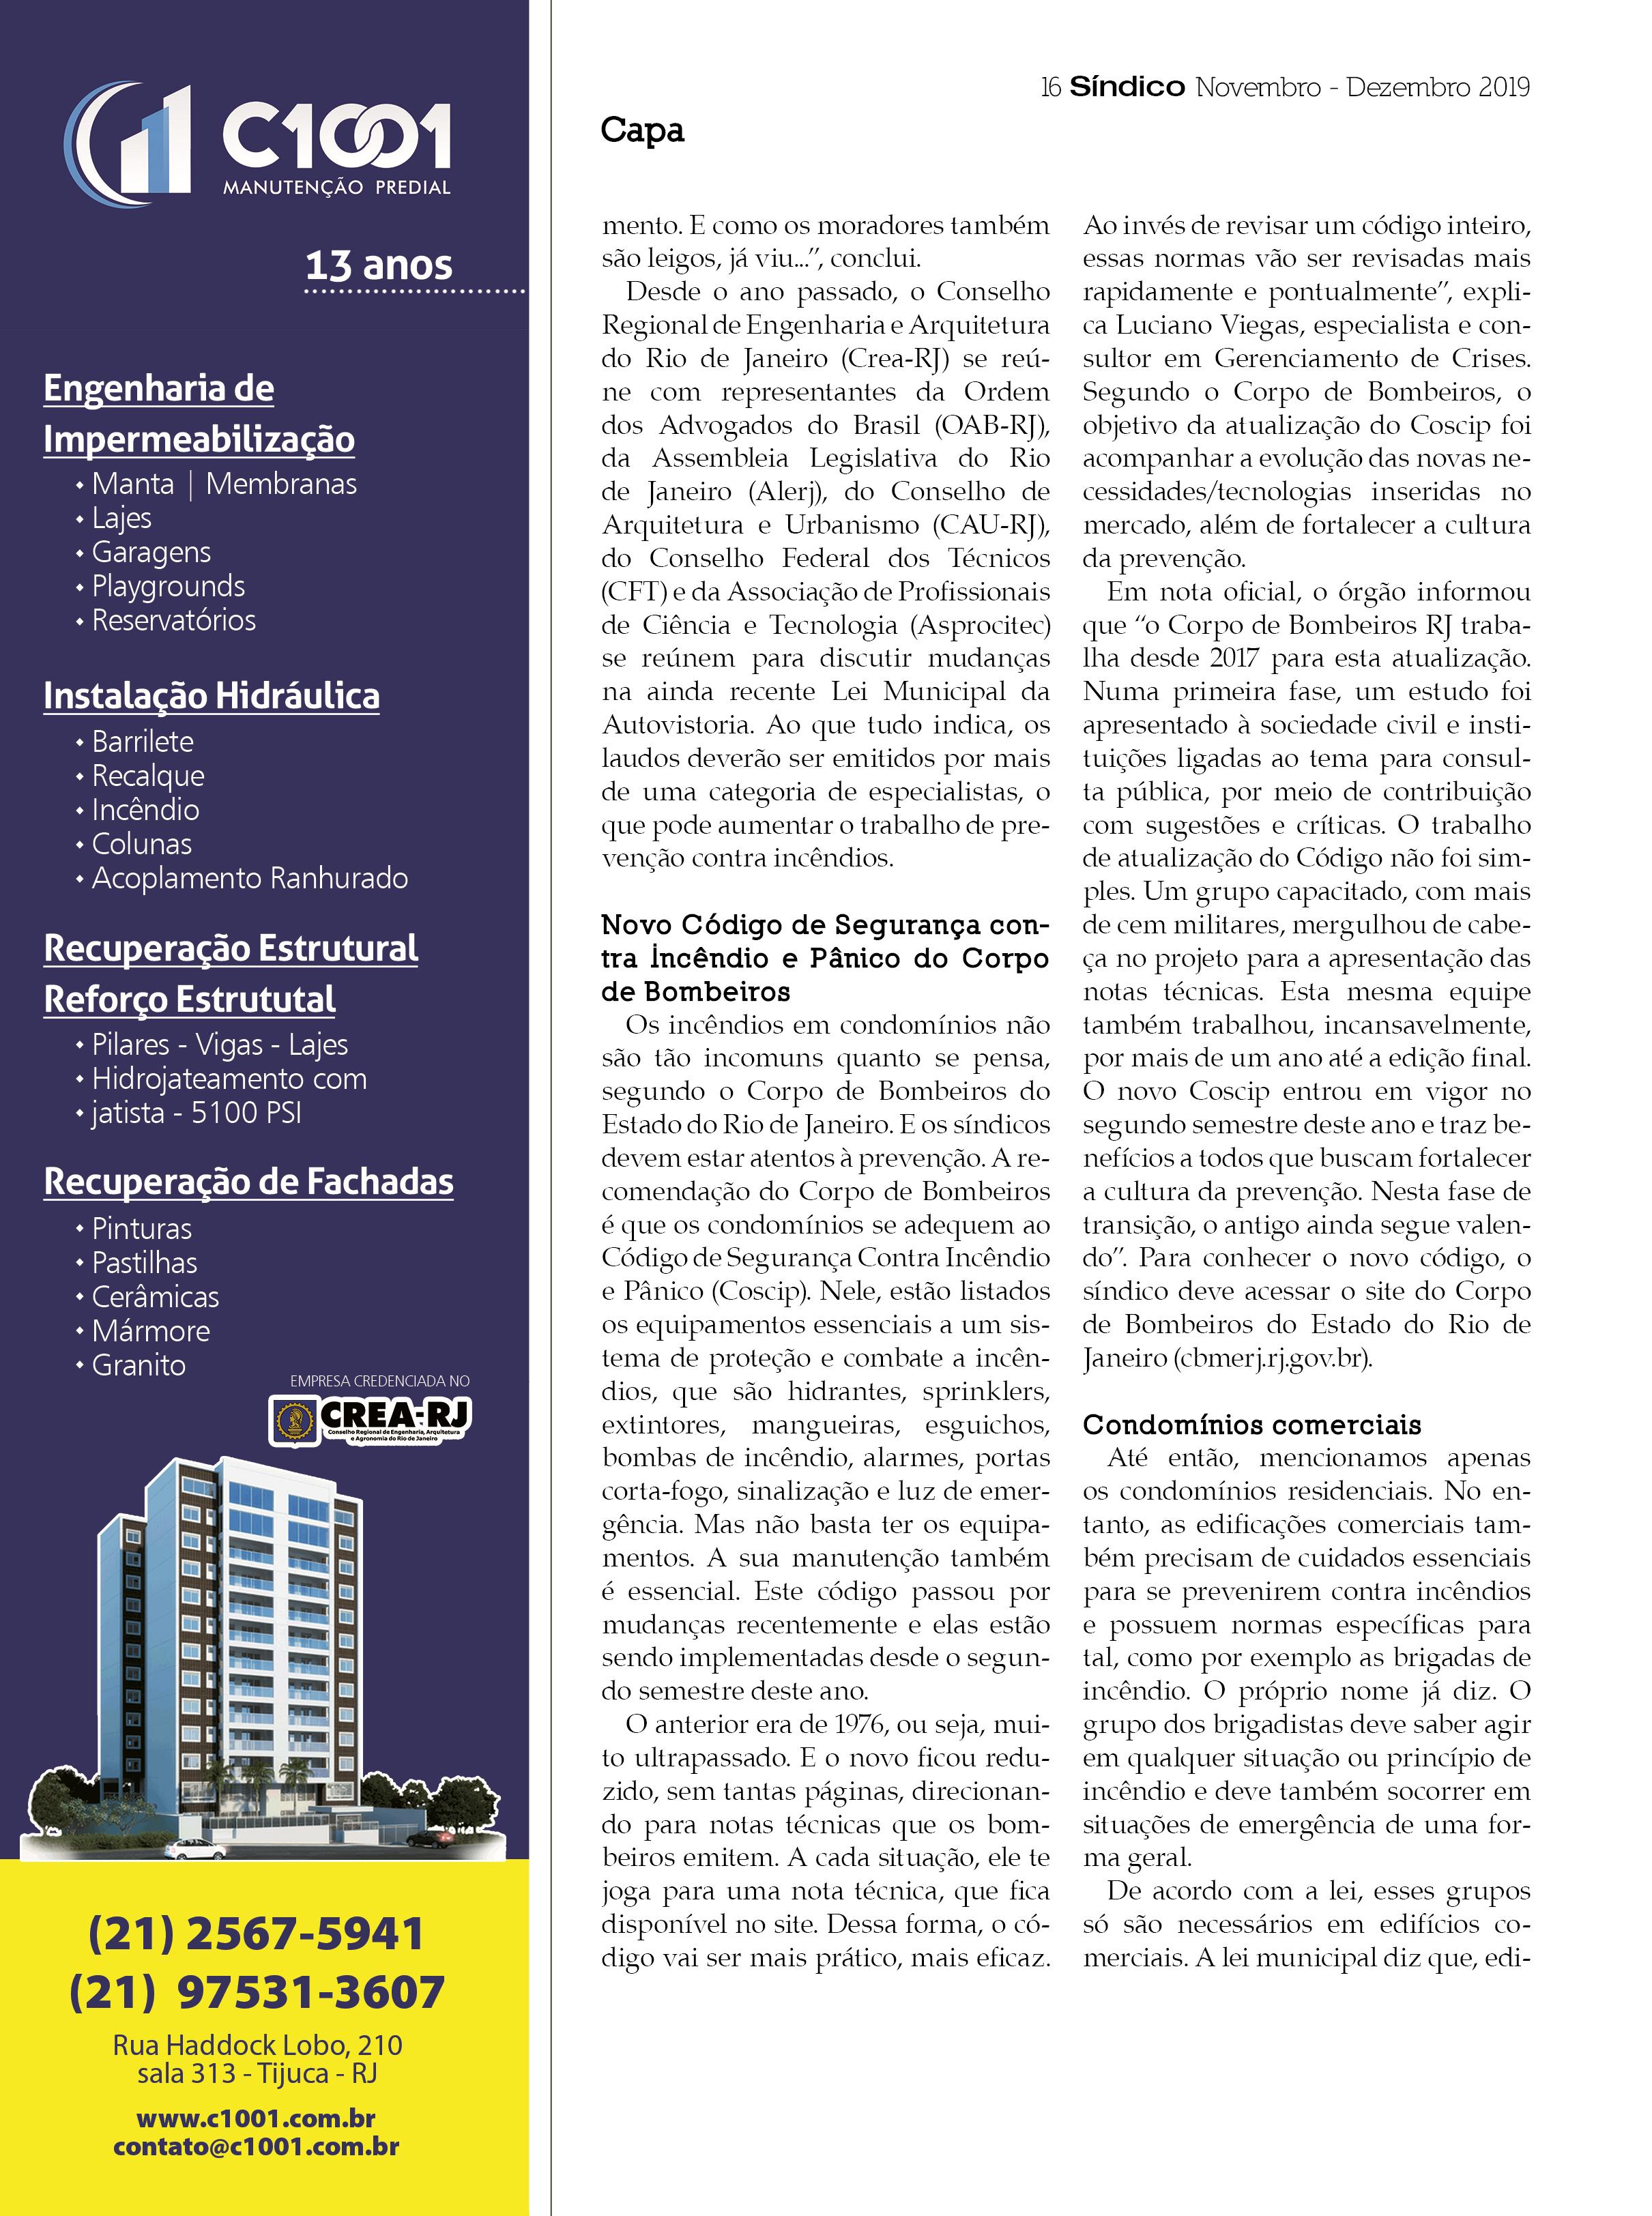 Revista Síndico_ed 247_14